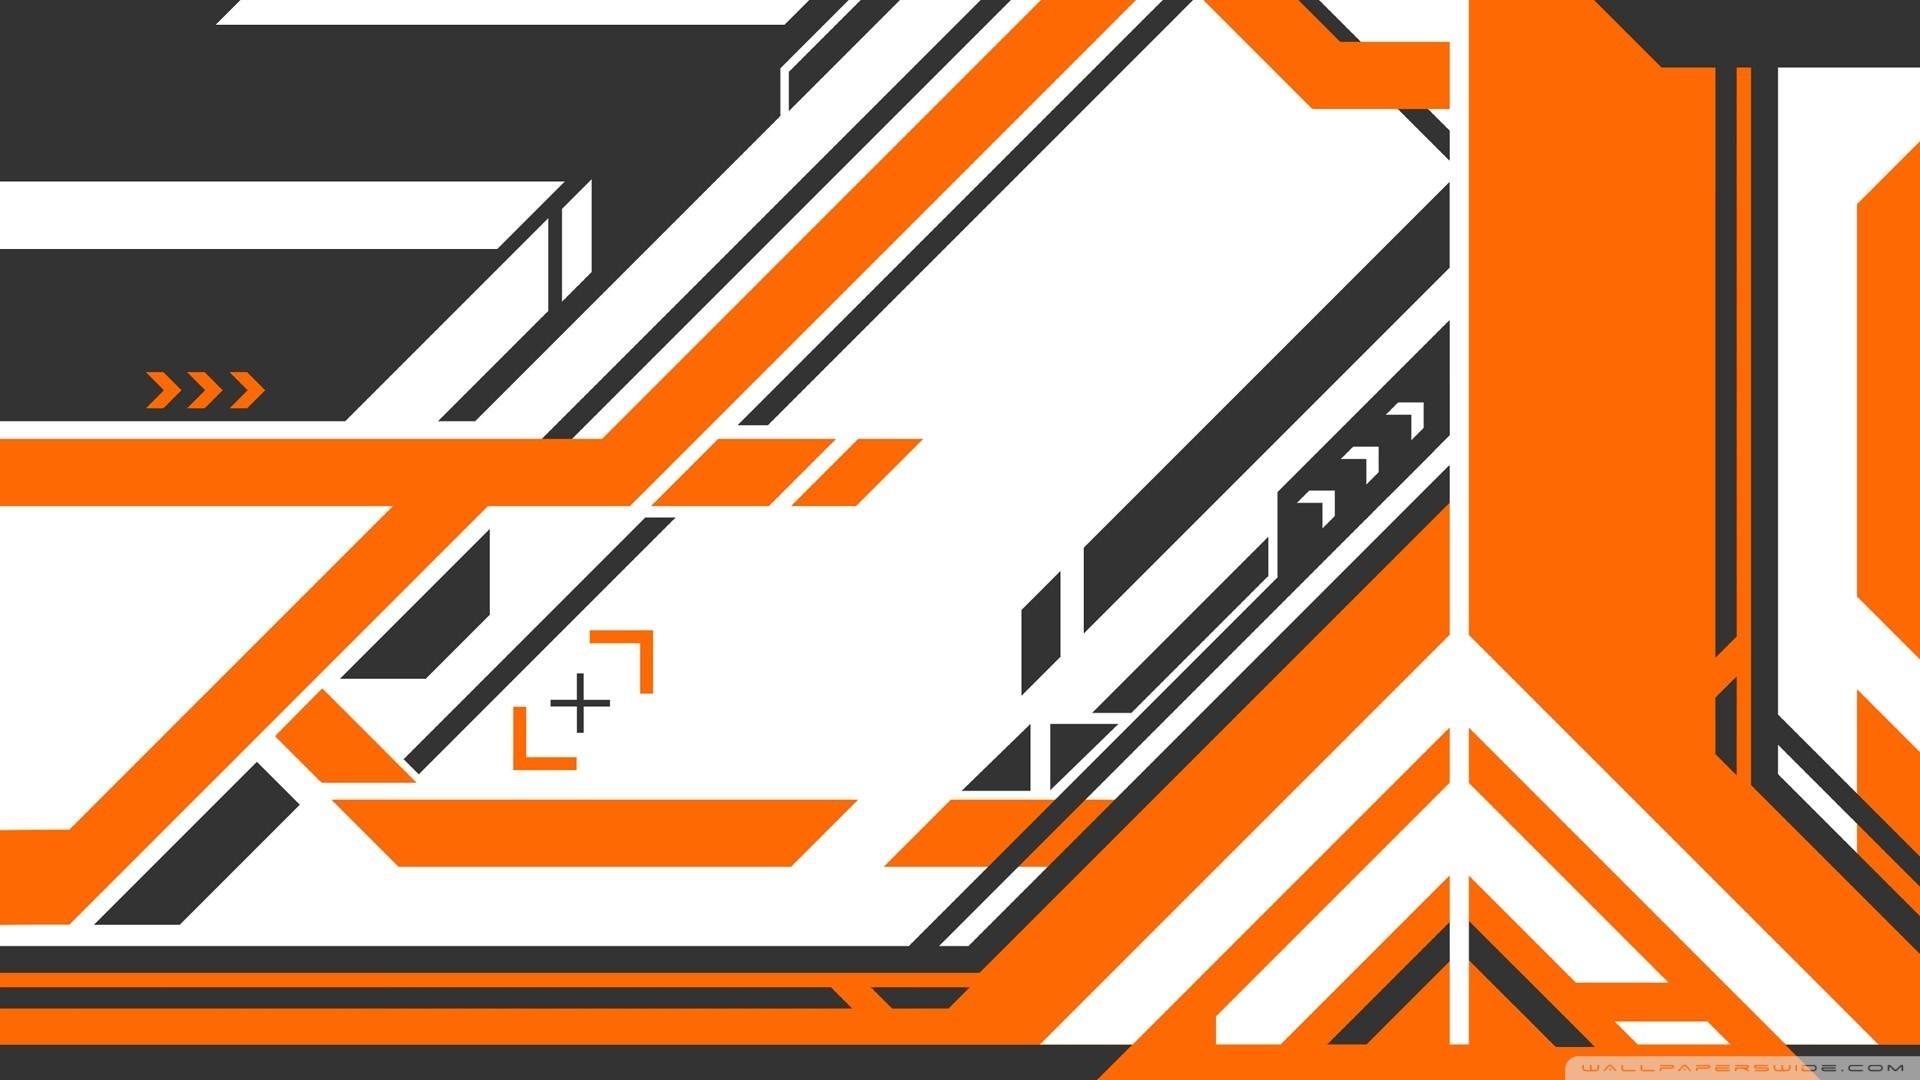 Free Asiimov phone wallpaper by pepnona